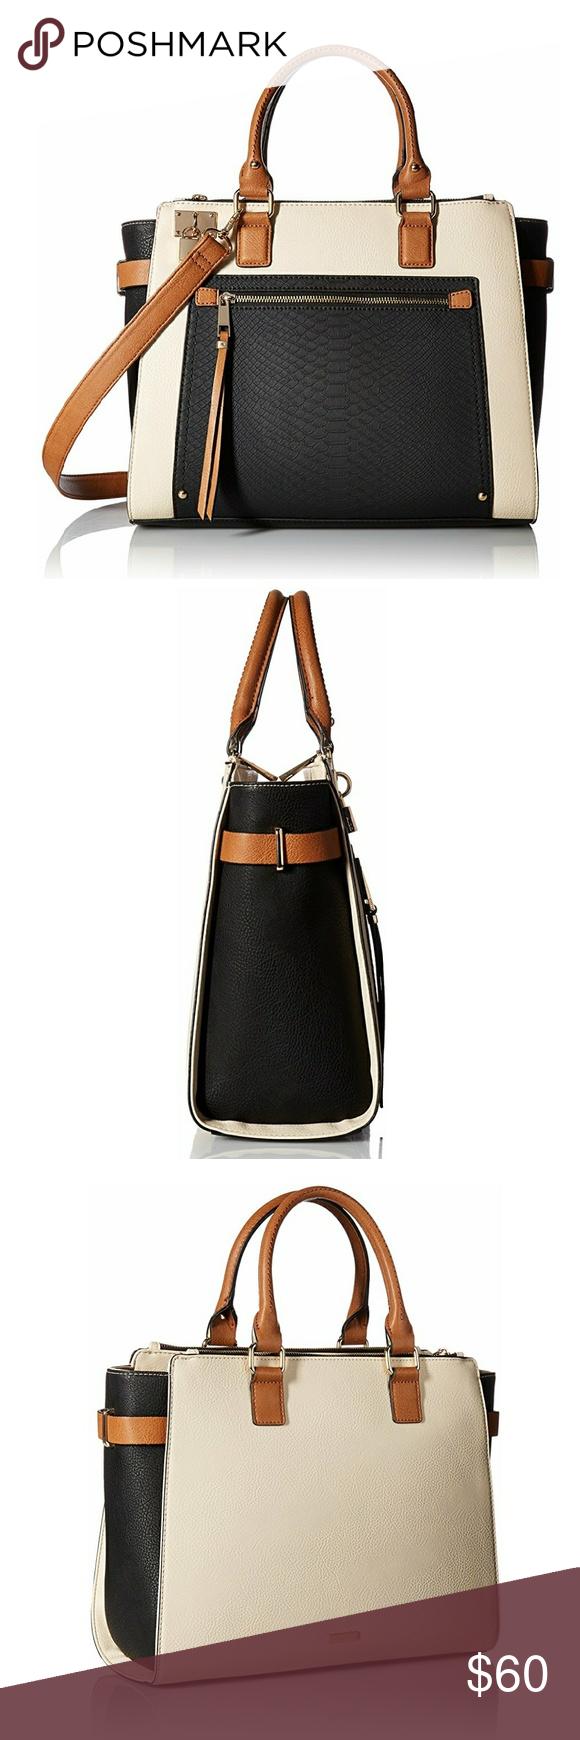 1f6933db648 I just added this listing on Poshmark  Aldo Hutcheon.  shopmycloset   poshmark  fashion  shopping  style  forsale  Aldo  Handbags